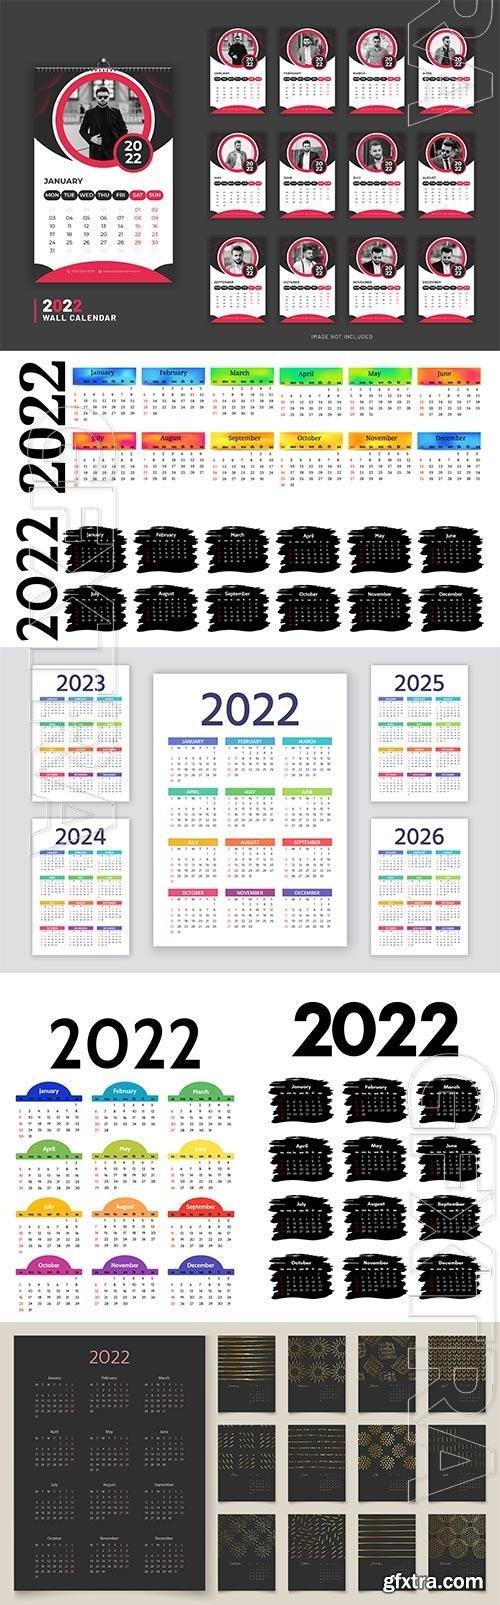 Calendar 2022 design template premium vector